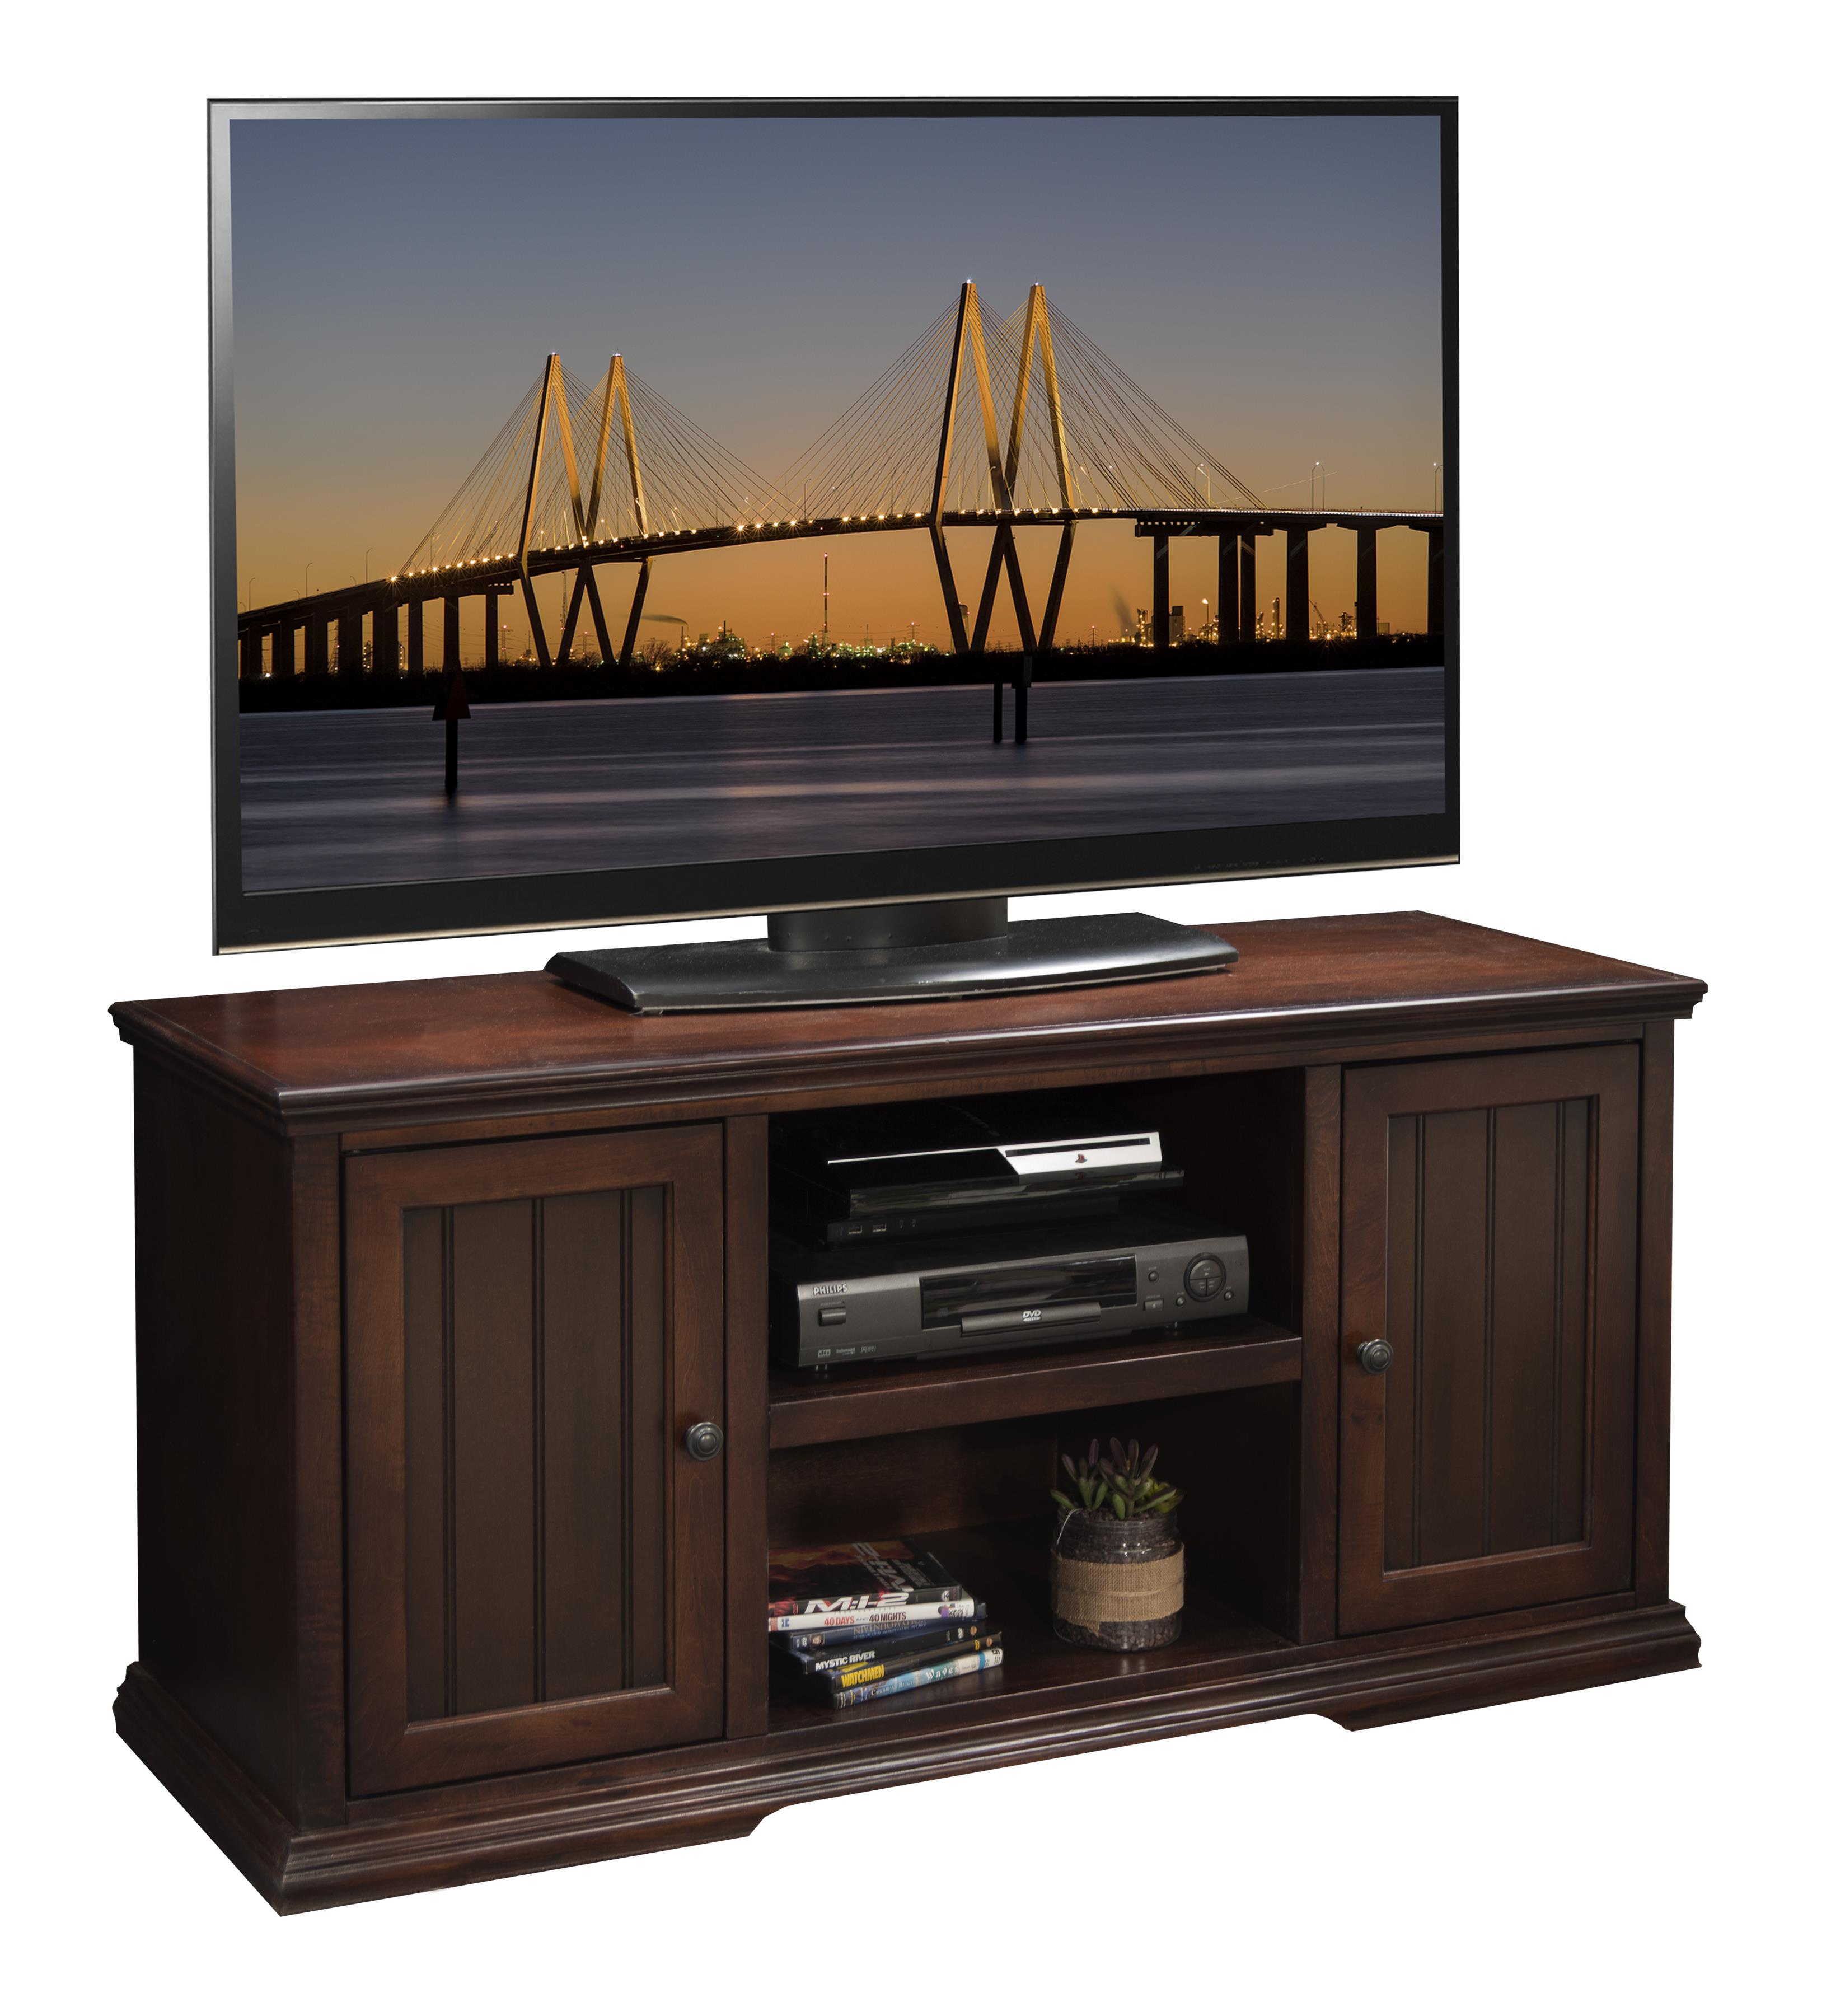 "Legends Furniture New Harbor 54"" TV Stand - Item Number: NH1227.DNC"